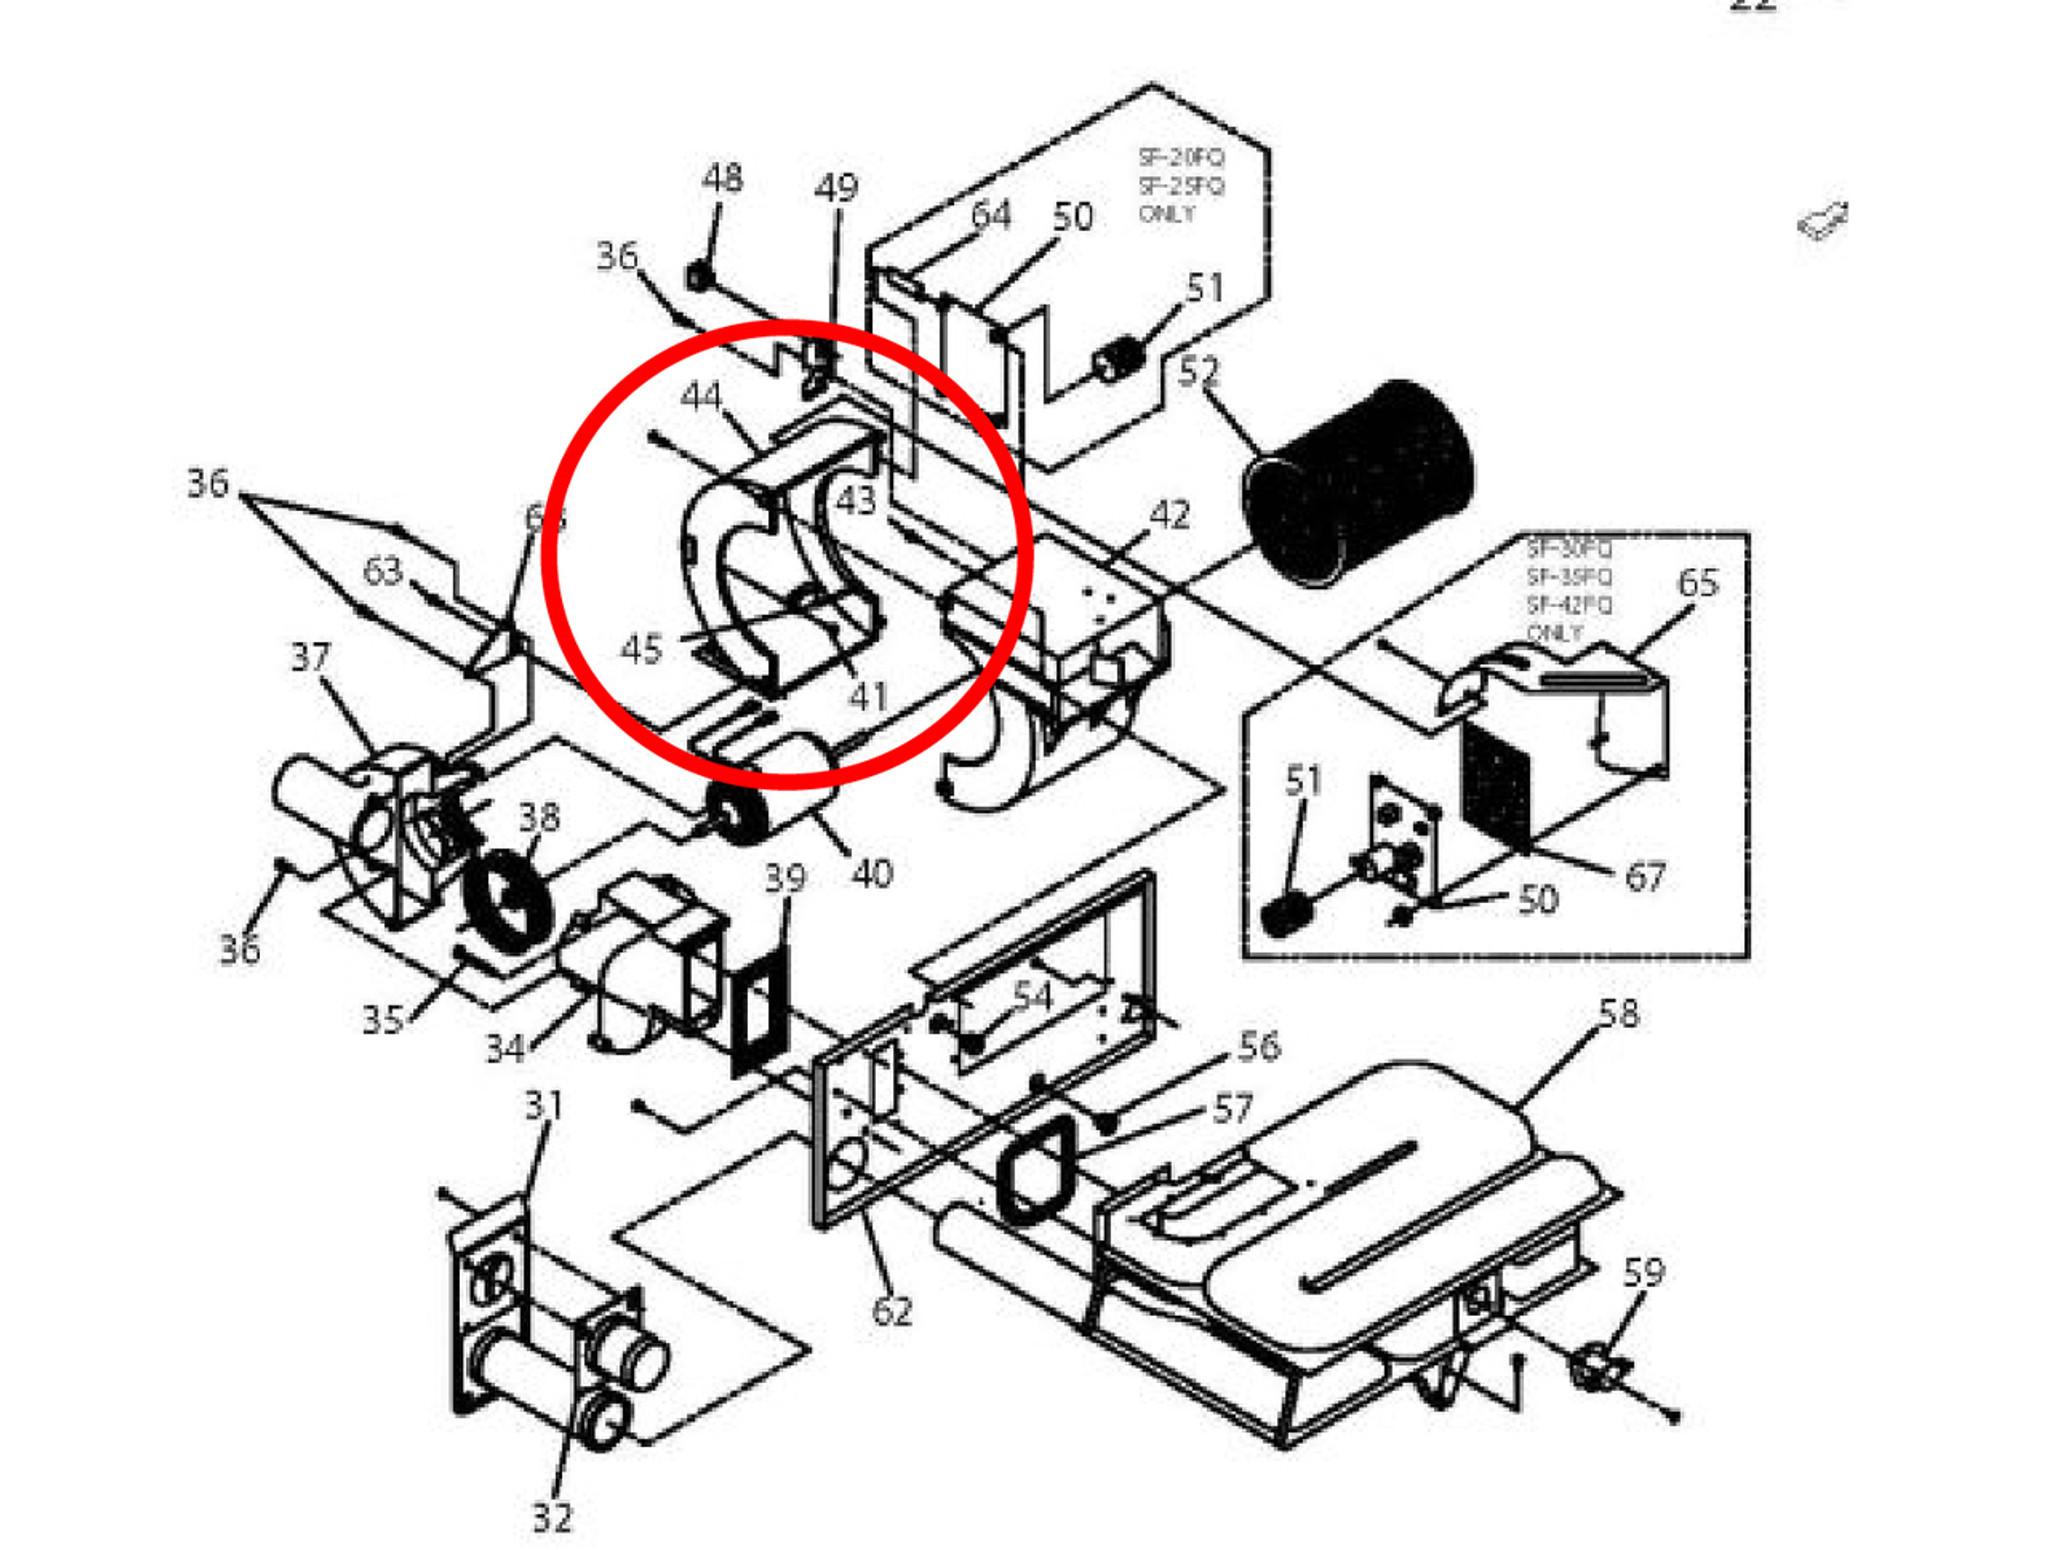 suburban rv furnace sf 42 wiring diagram wiring library gas furnace relay wiring diagram suburban rv furnace sf 42 wiring diagram [ 1280 x 969 Pixel ]